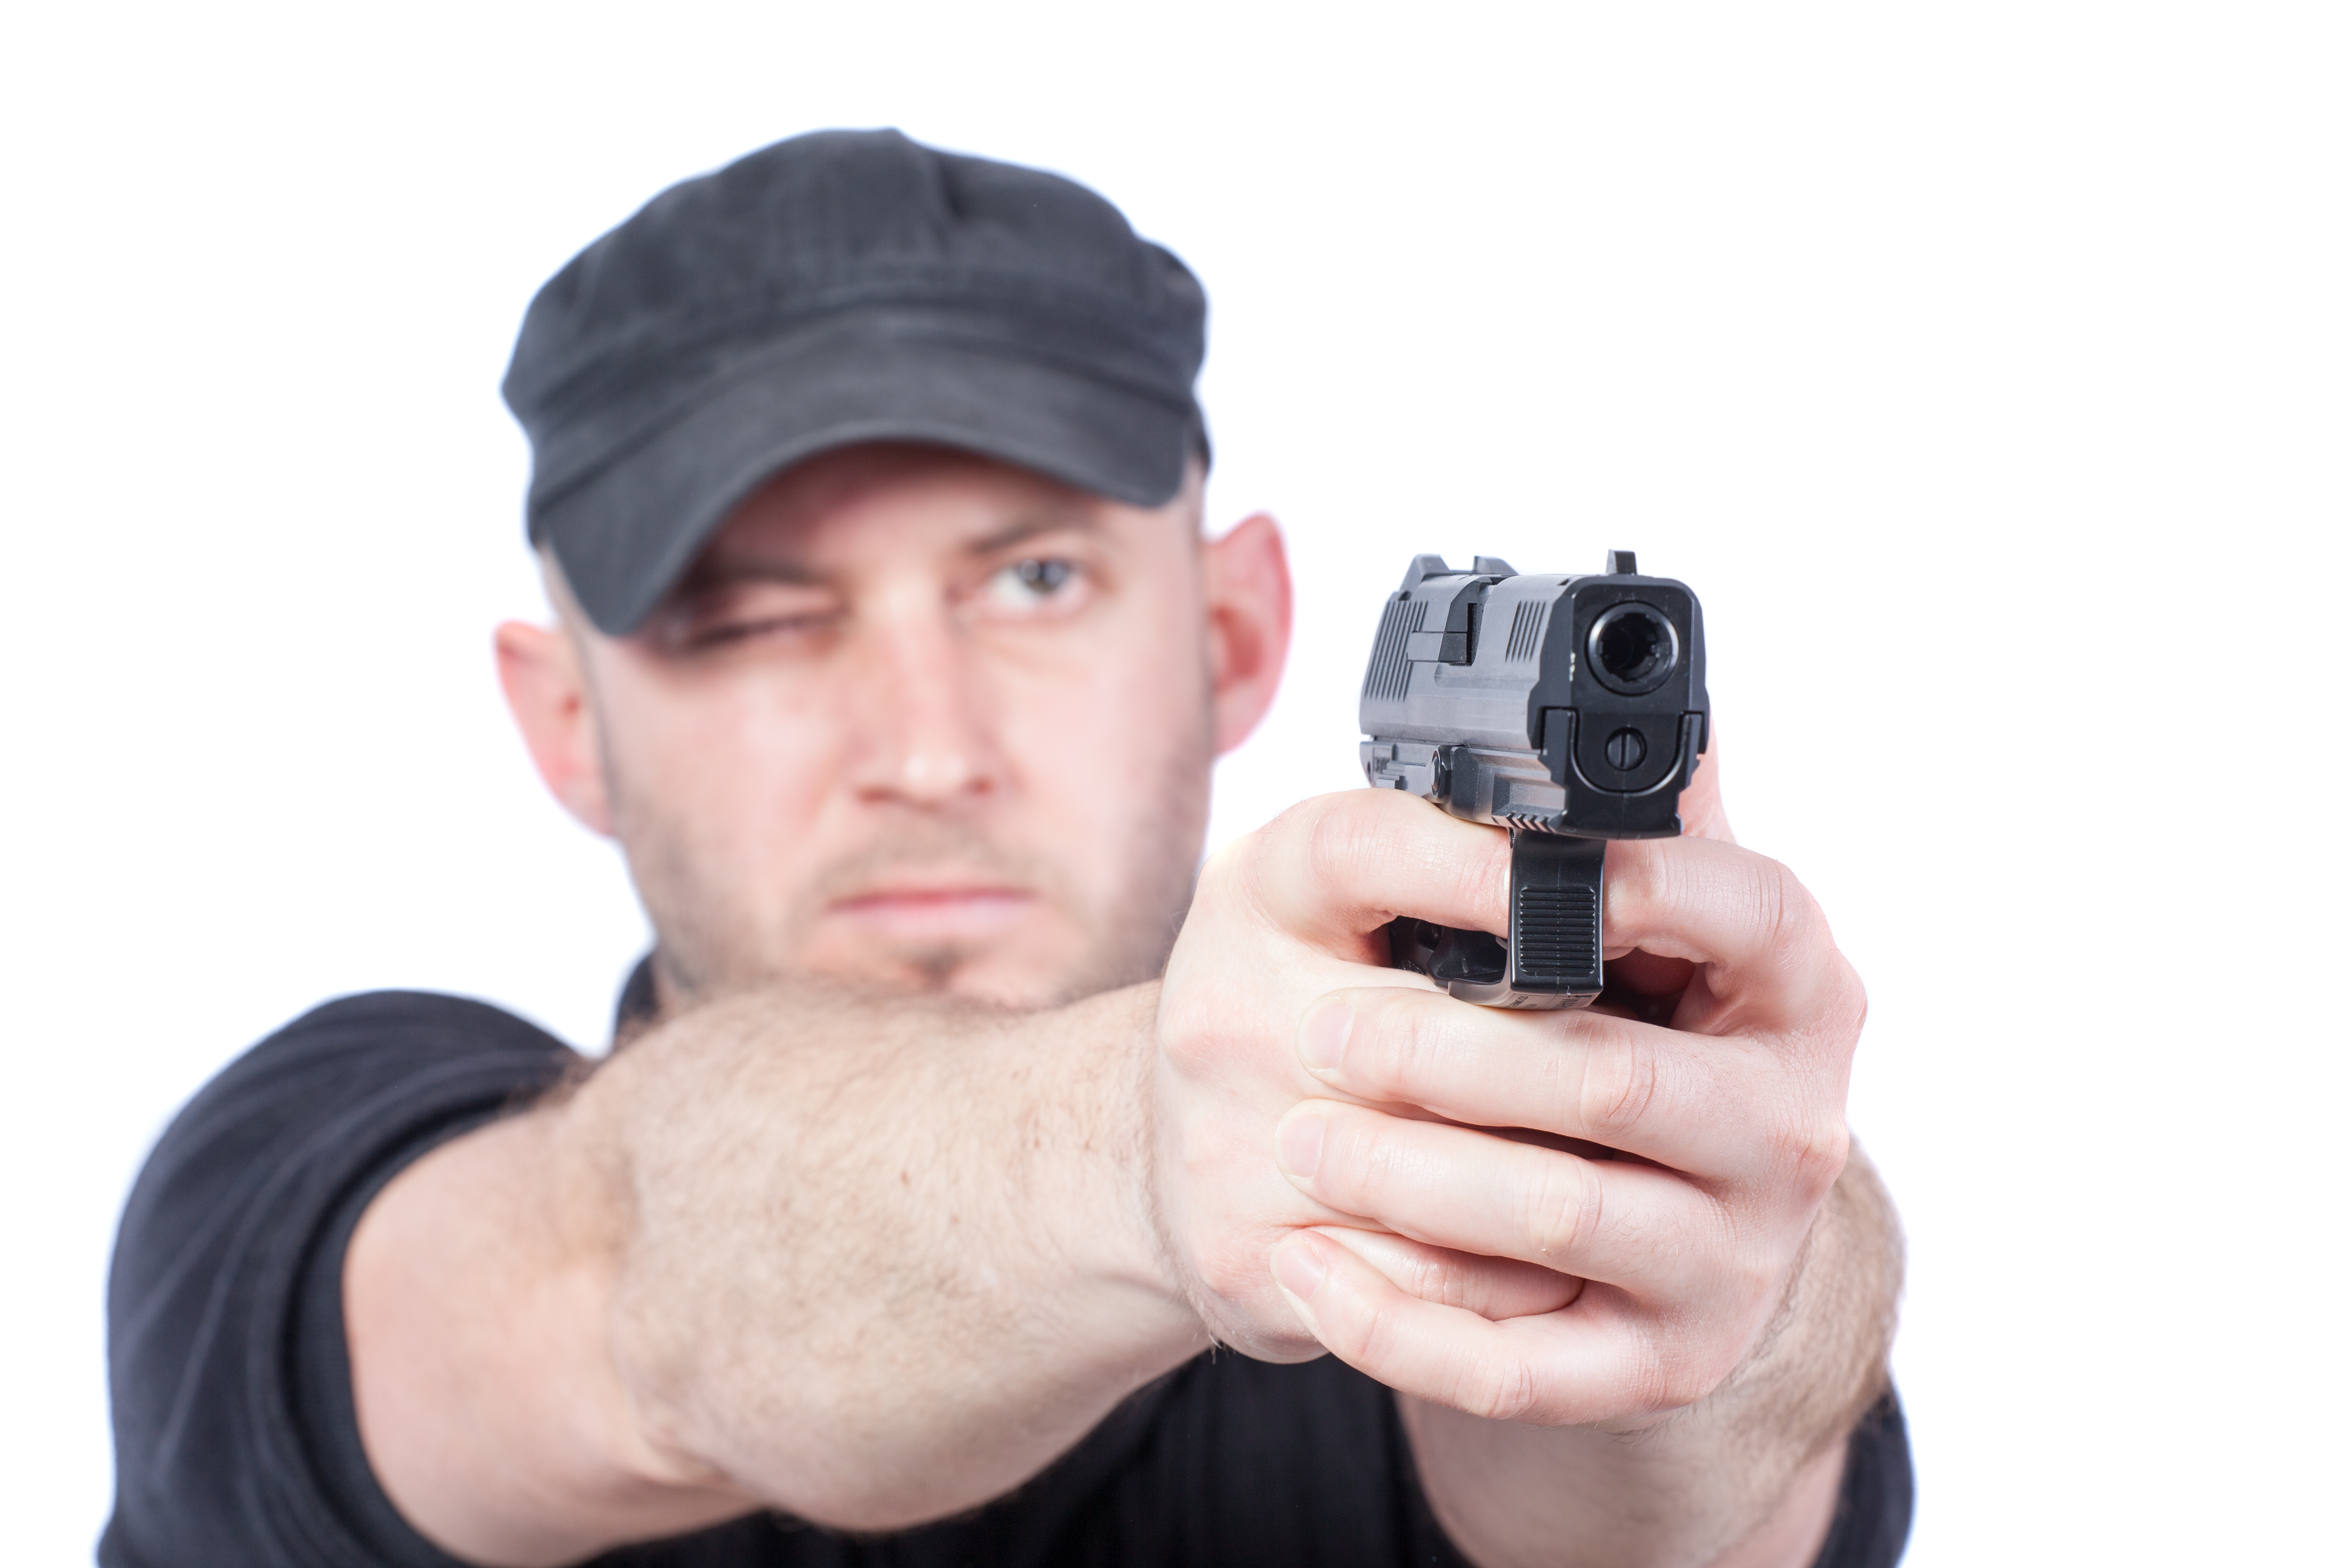 Strzelec z pistoletem ASG Walther PPQ